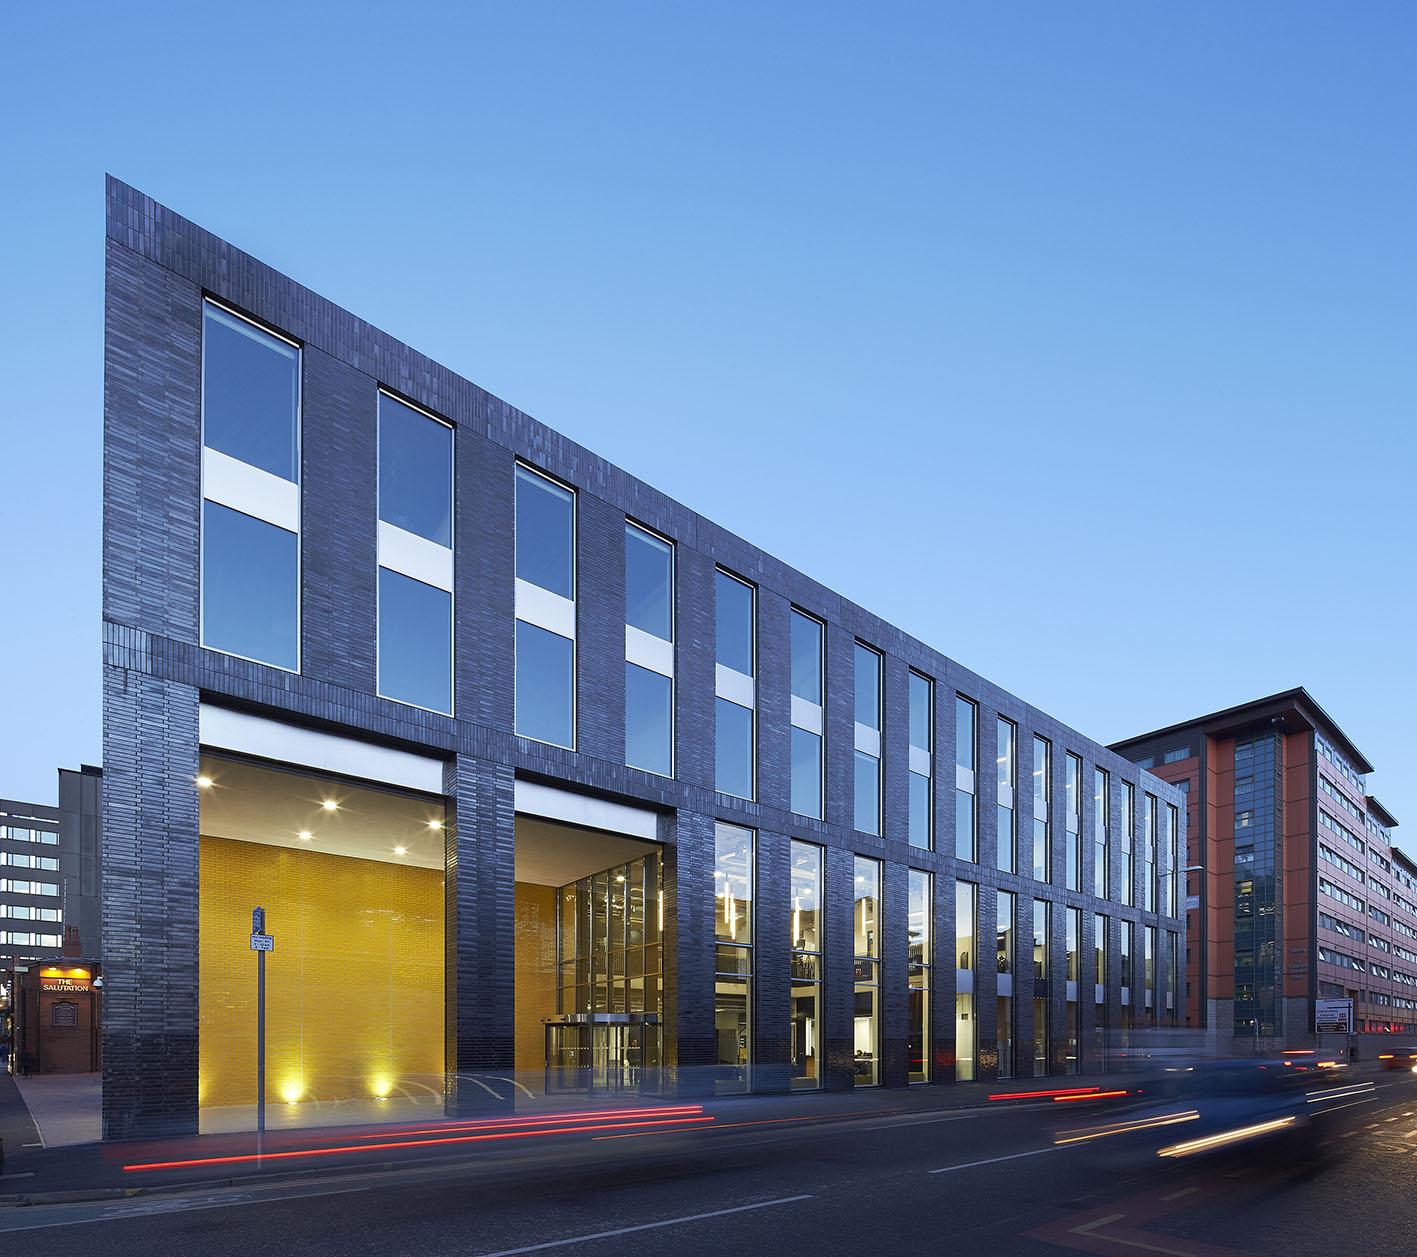 Manchester Metropolitan University Students Union